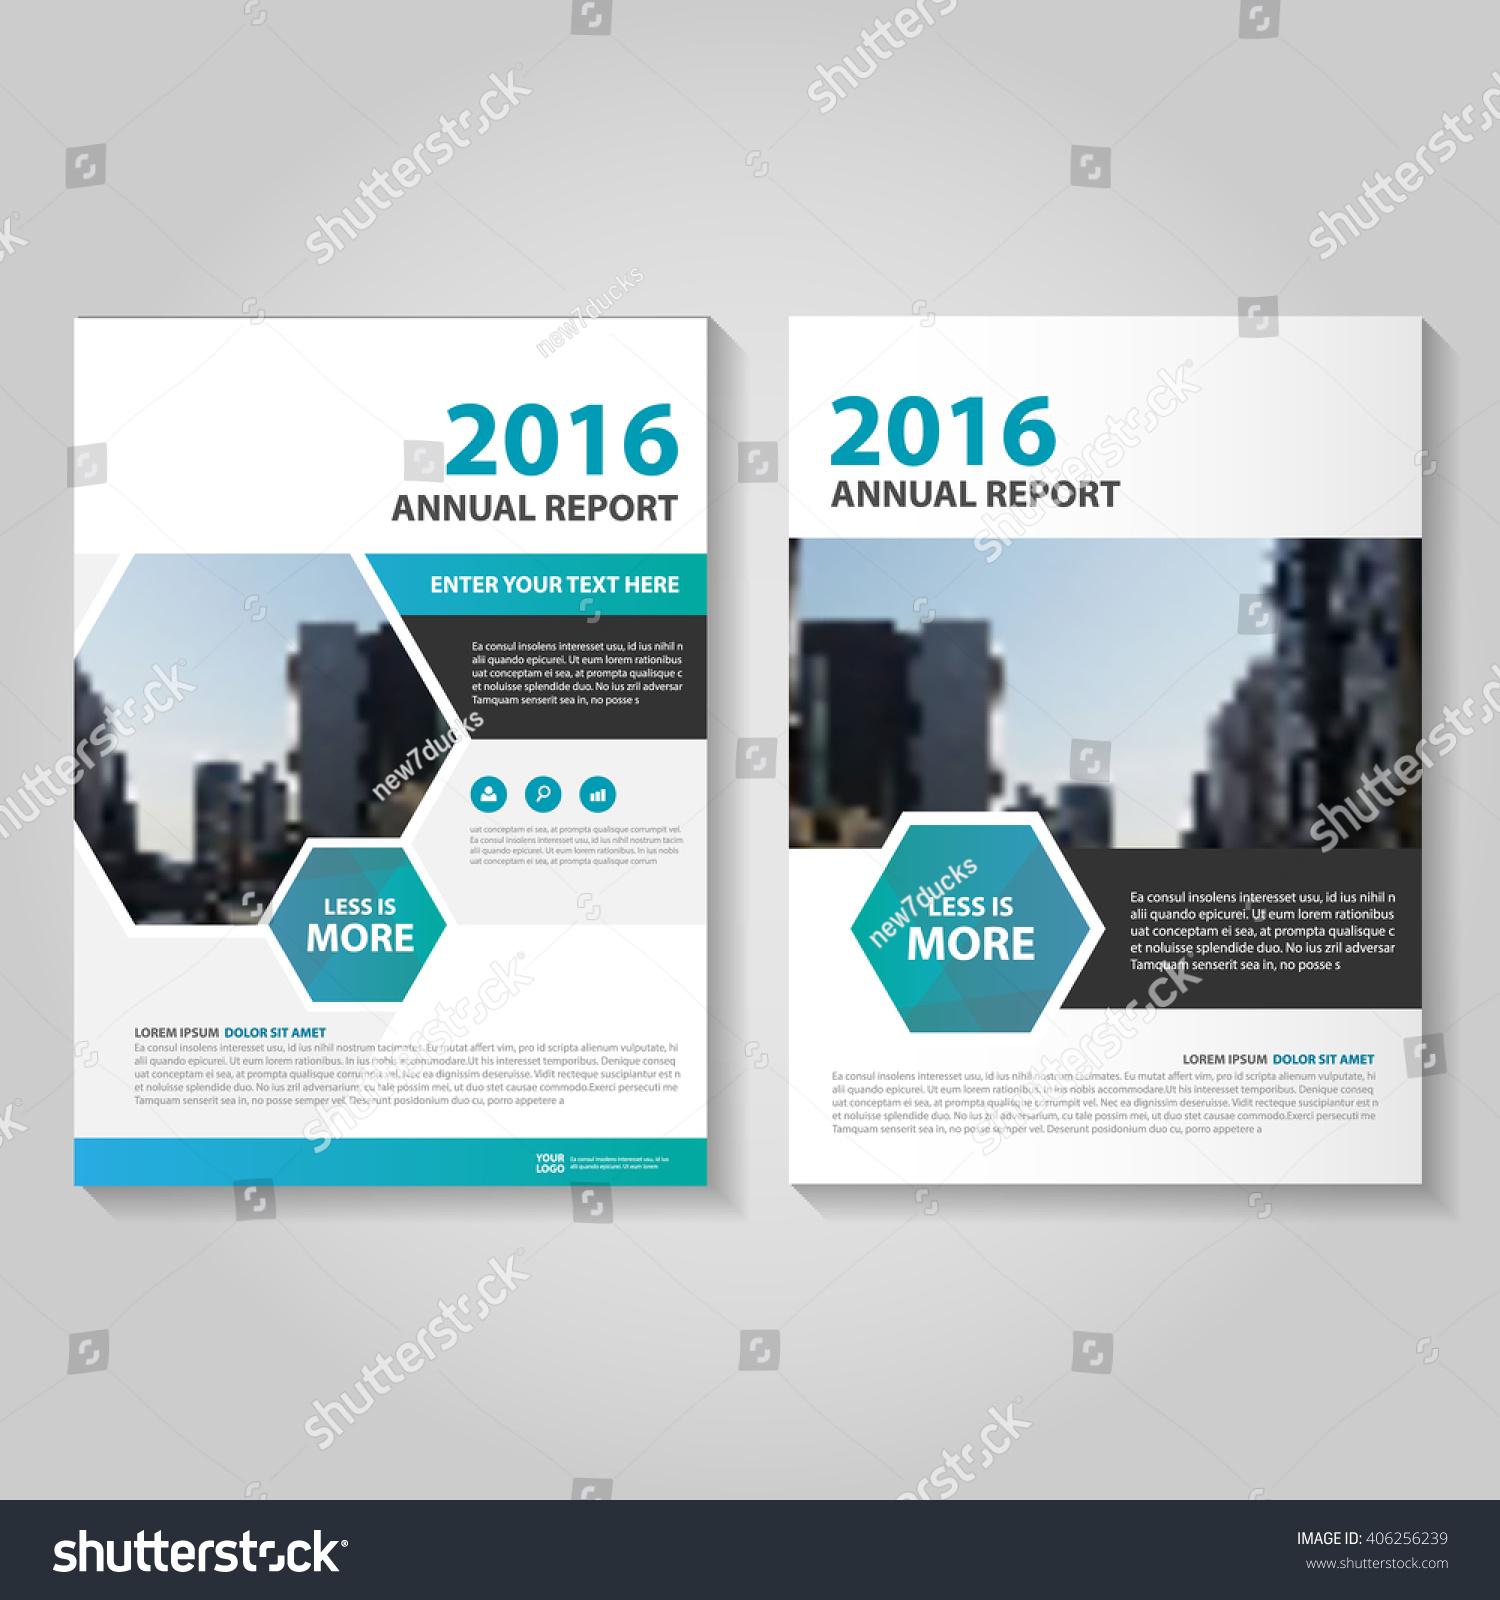 blue green hexagon vector annual report のベクター画像素材